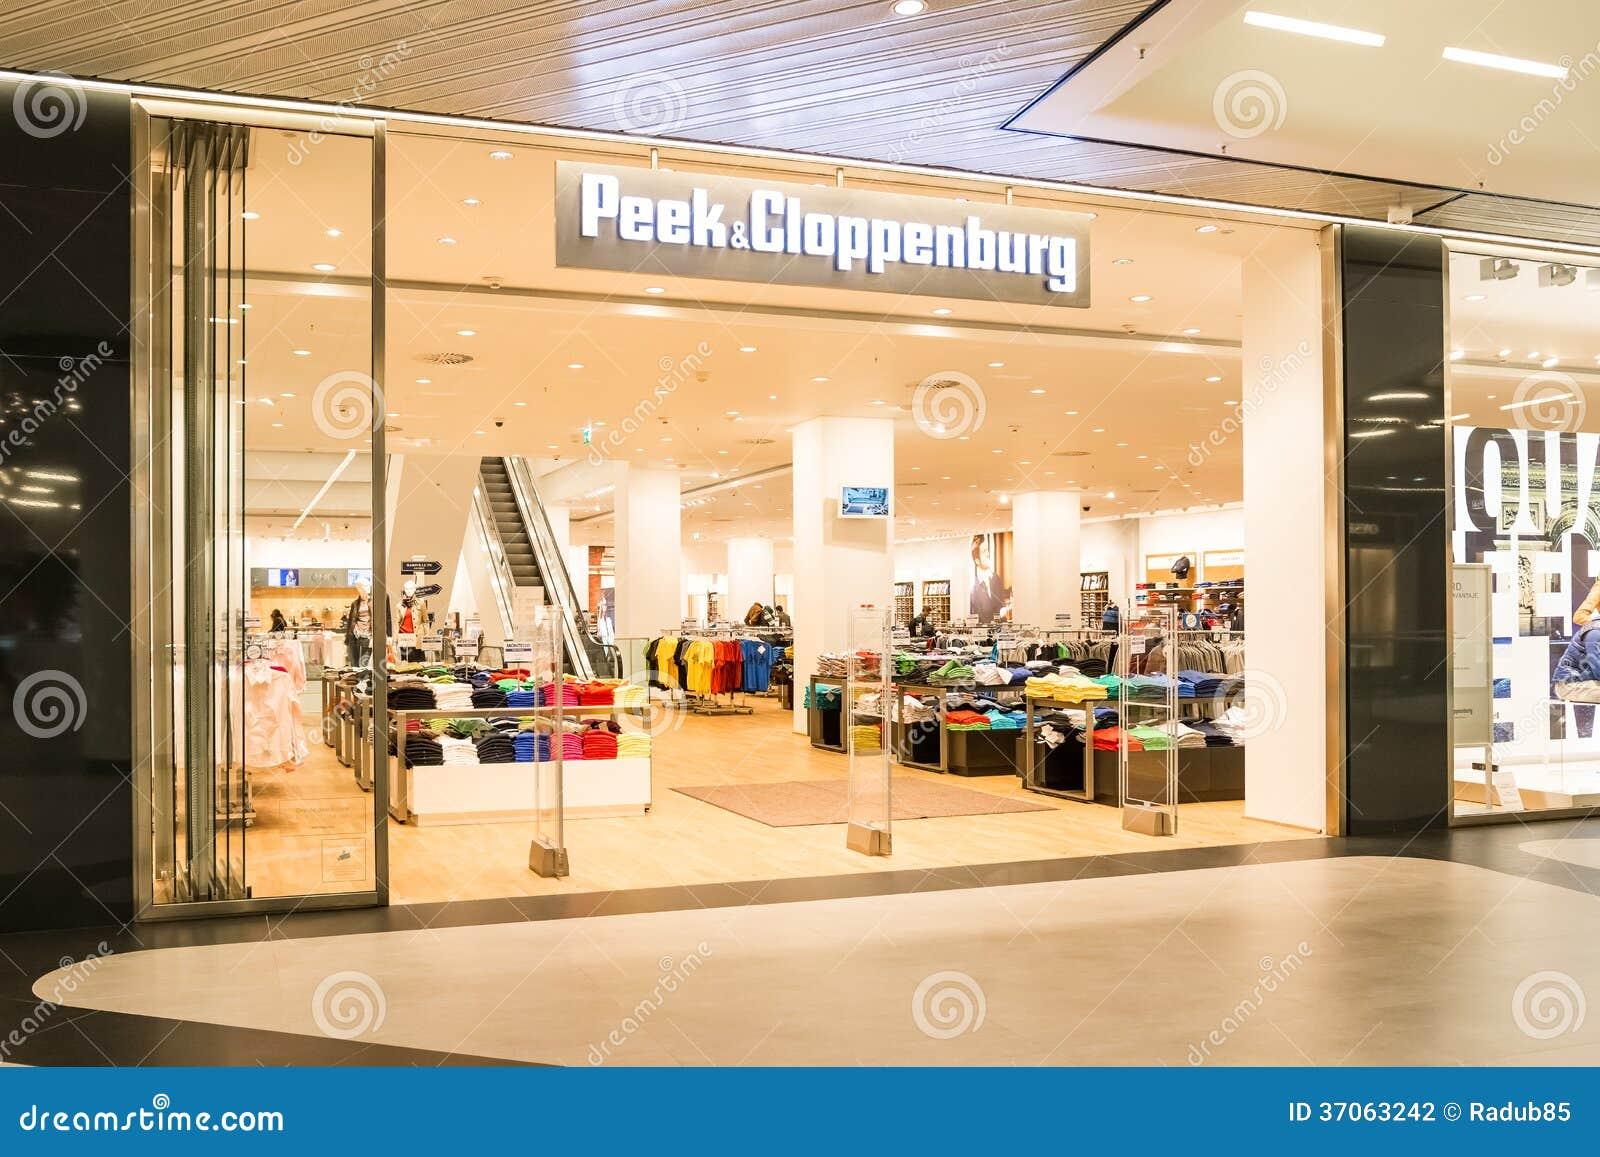 Peek and cloppenburg online shop